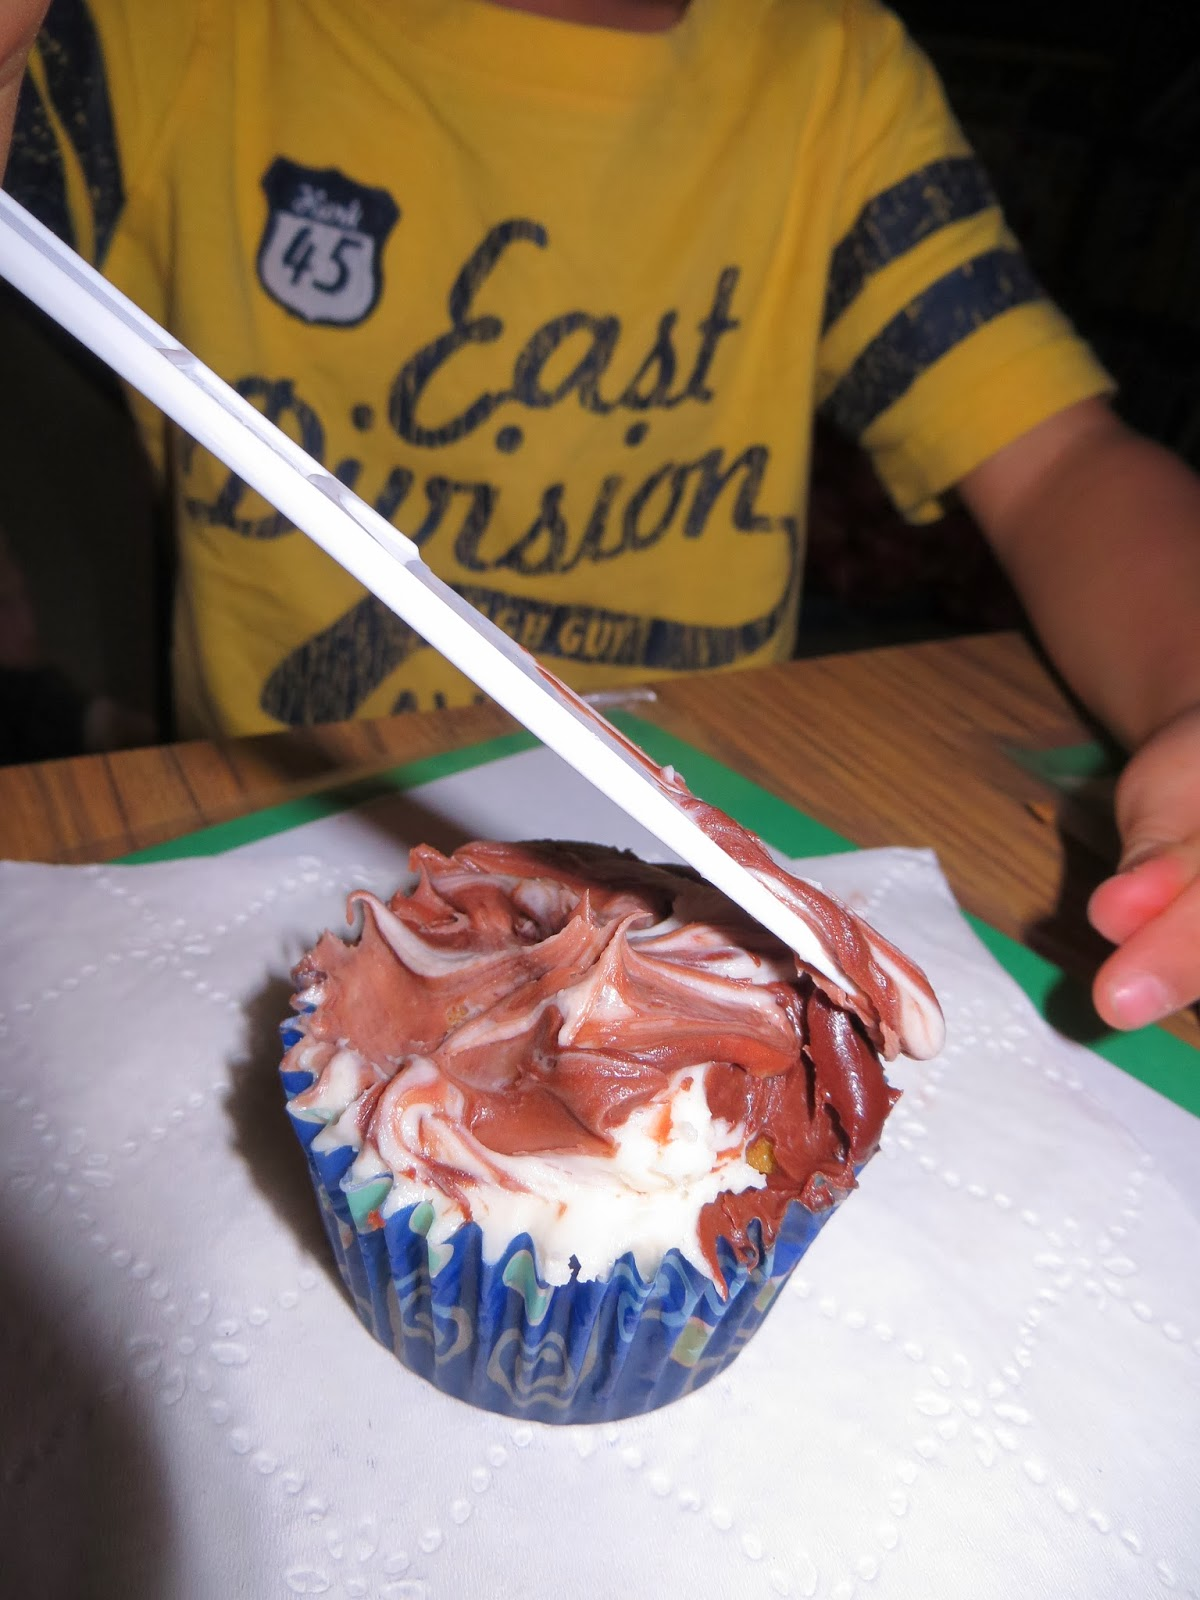 Justice cupcake snack MLK